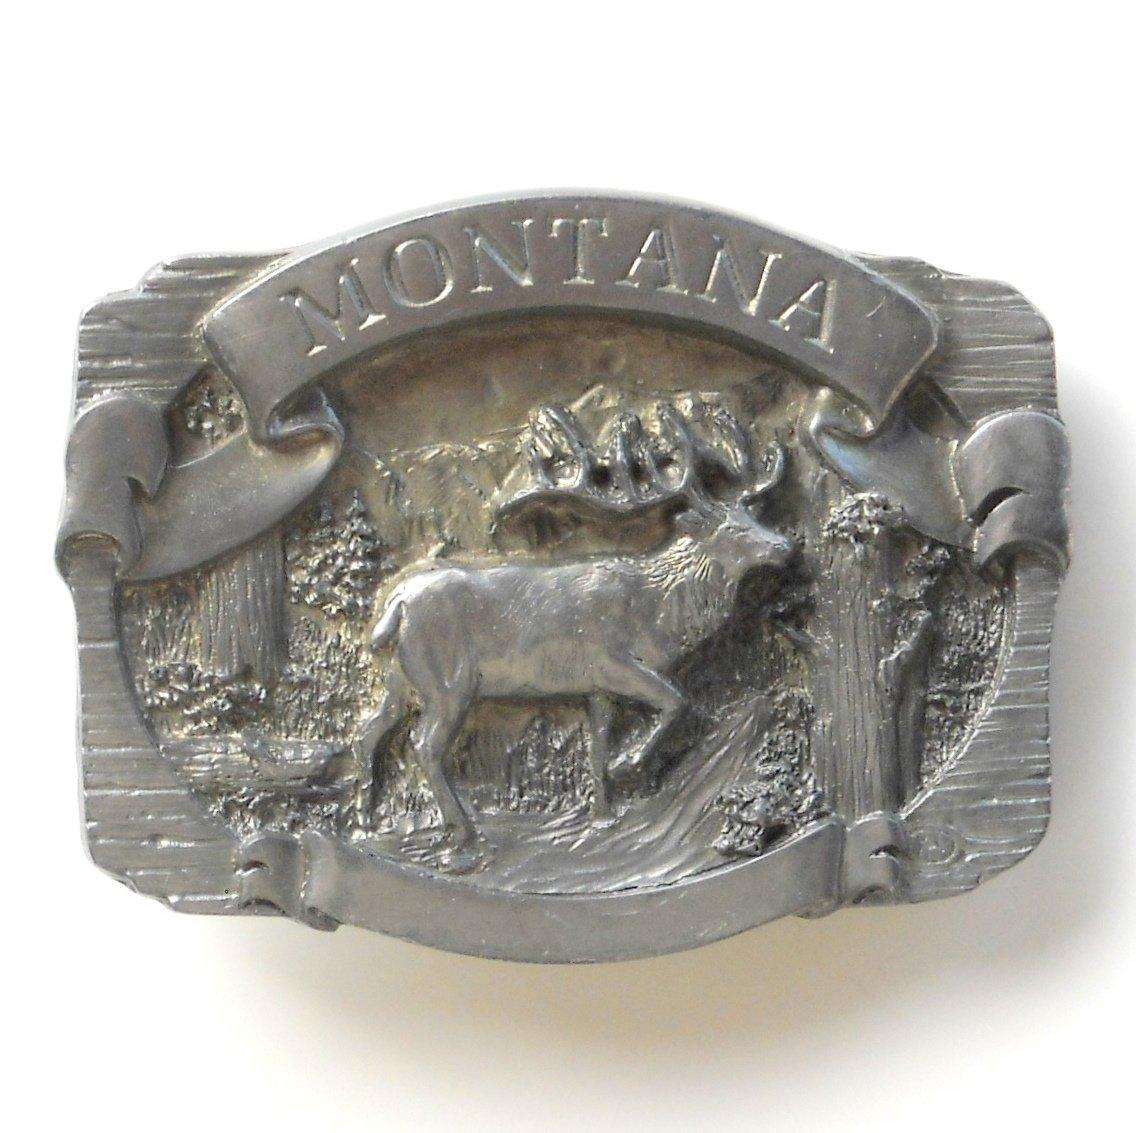 Montana Elk 3D C J Pewter Belt Buckle